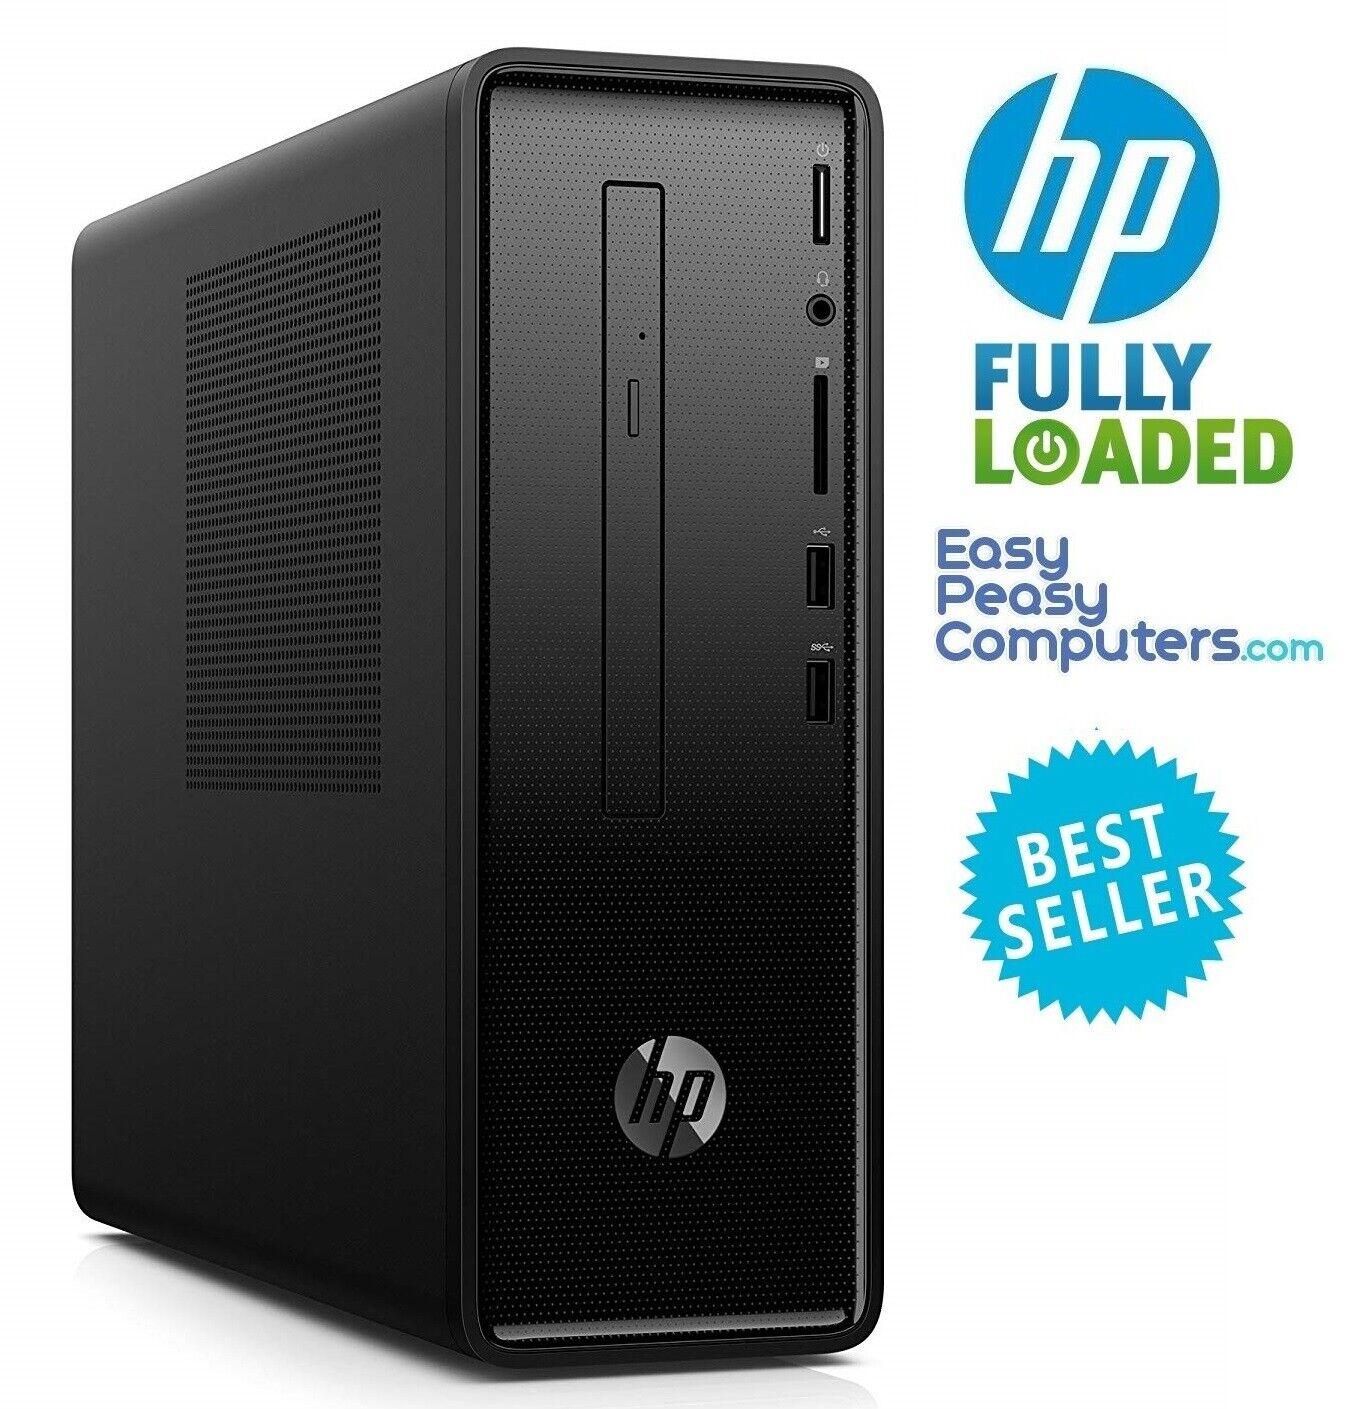 HP Desktop PC Computer WIN10 16GB 1TB Bluetooth WiFi DVD+RW HDMI (FULLY LOADED)